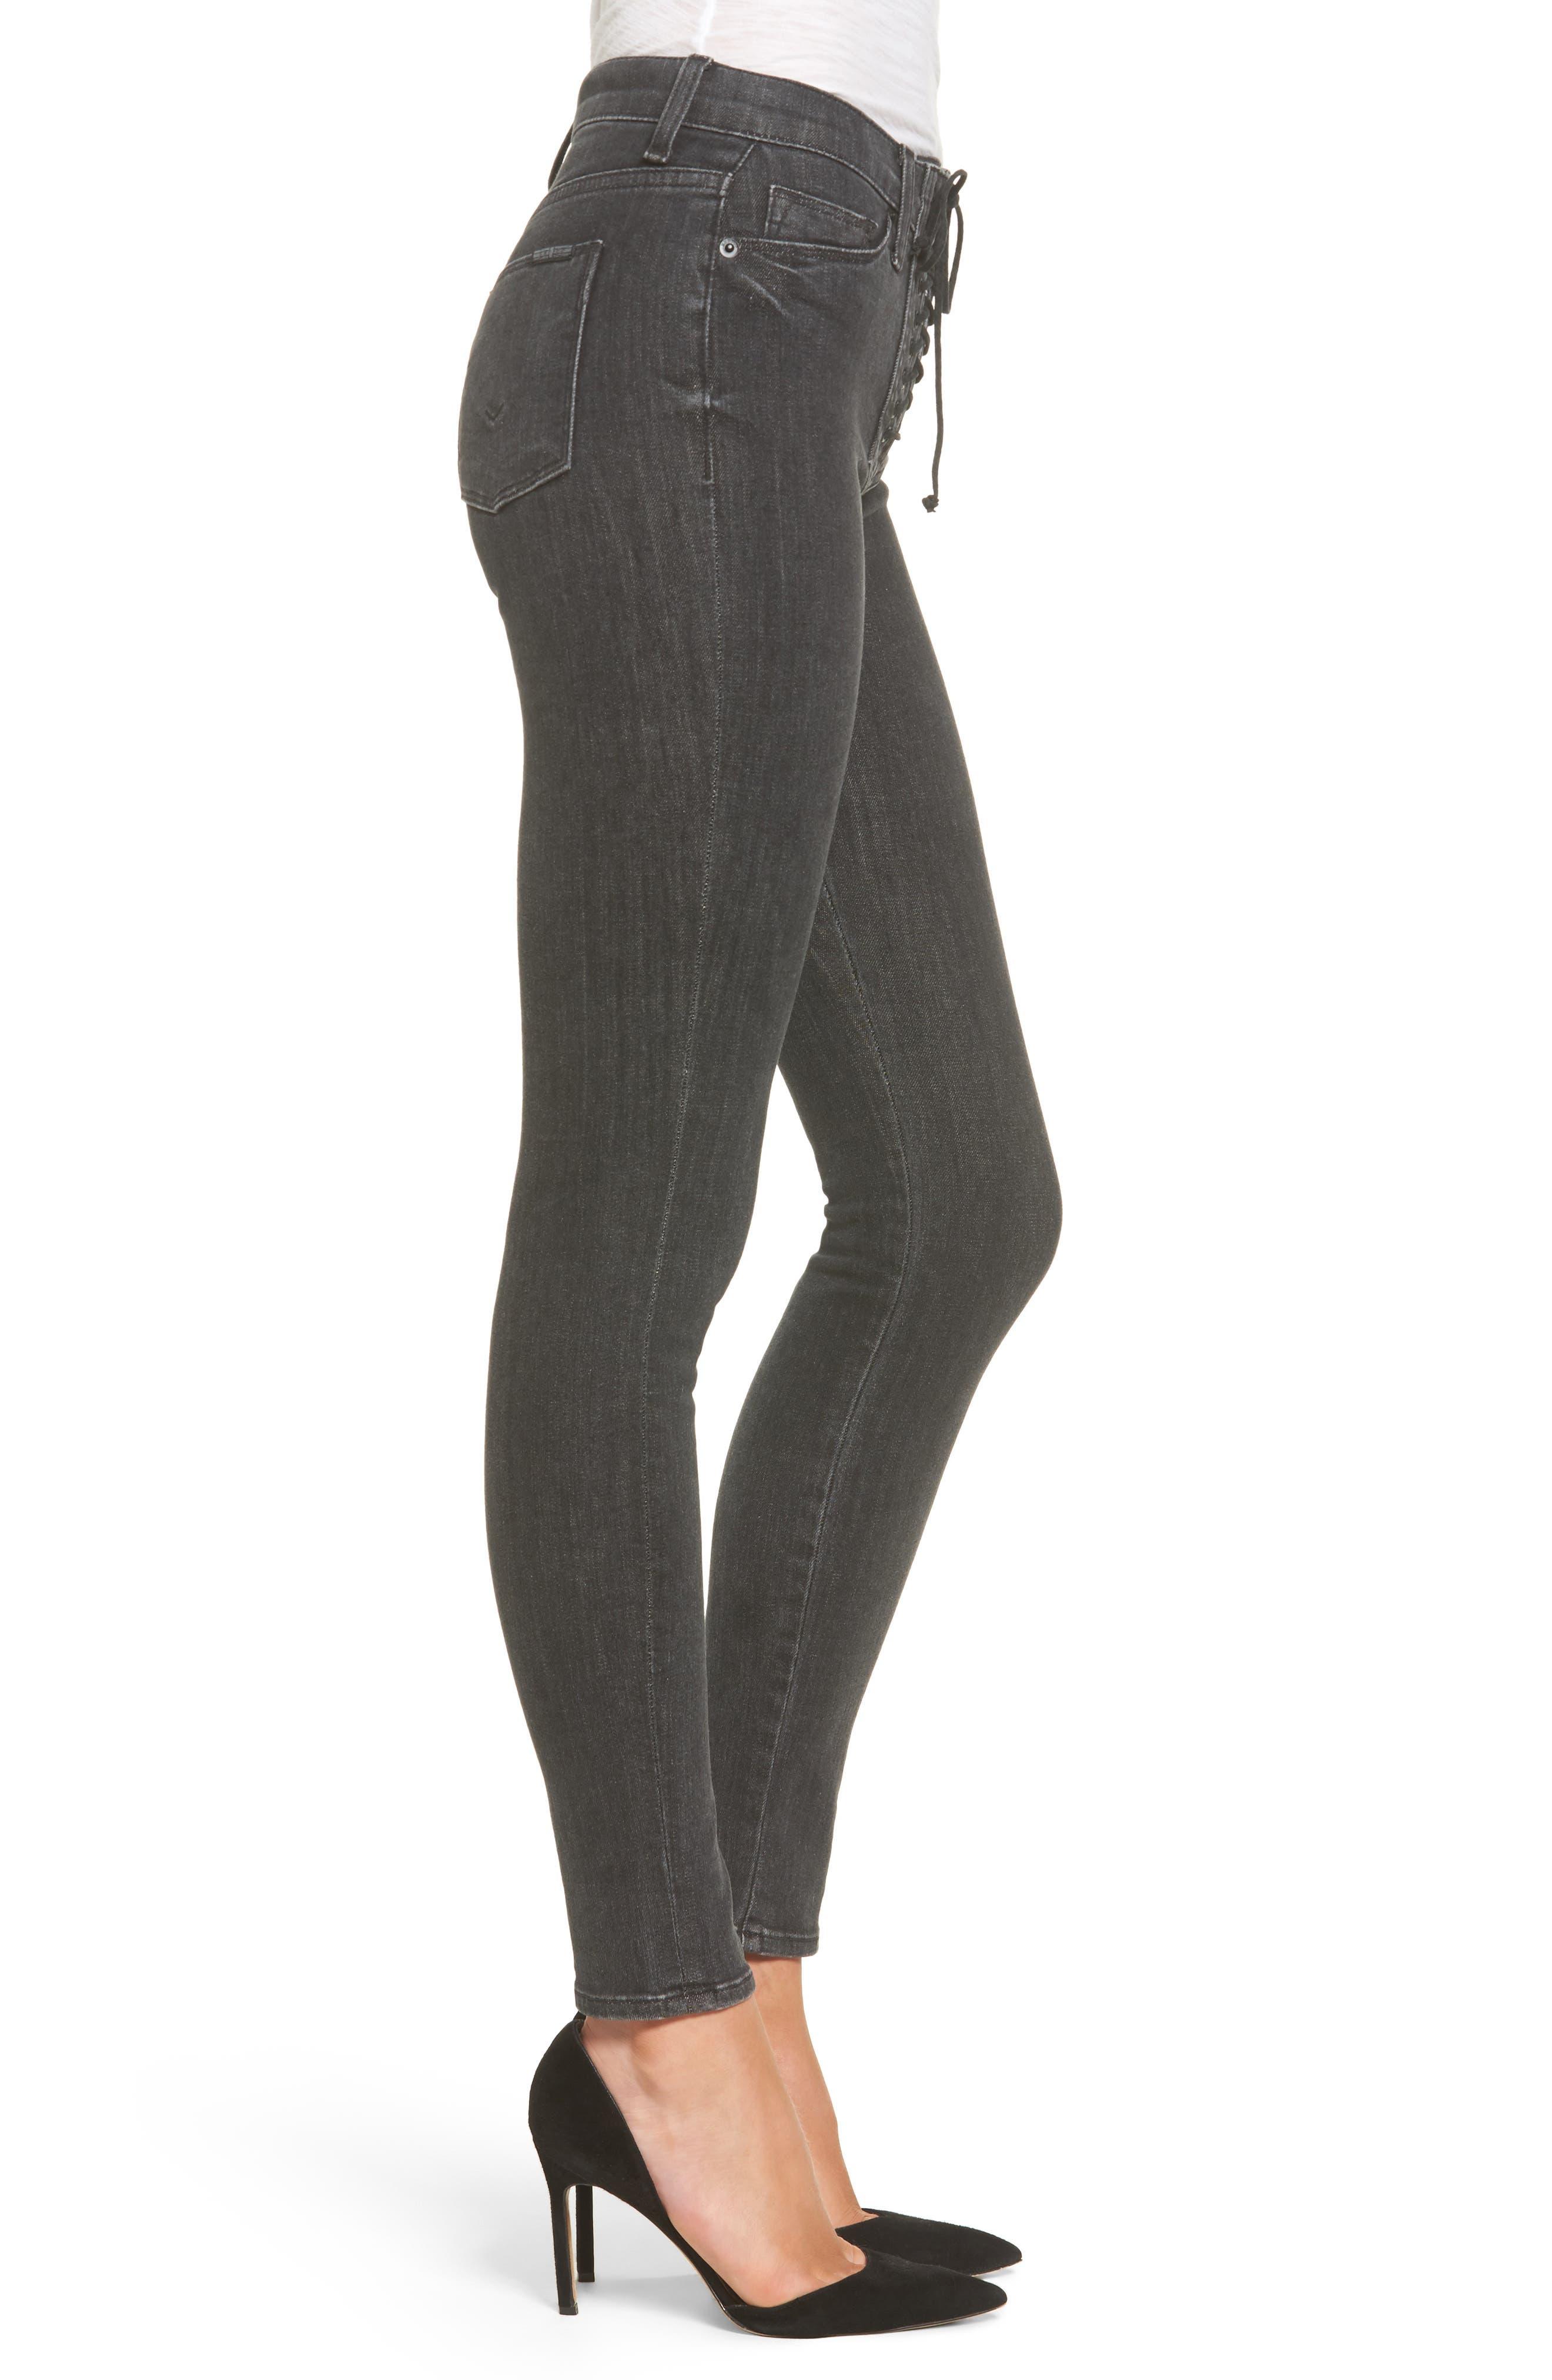 Bullocks High Waist Lace-Up Skinny Jeans,                             Alternate thumbnail 3, color,                             001